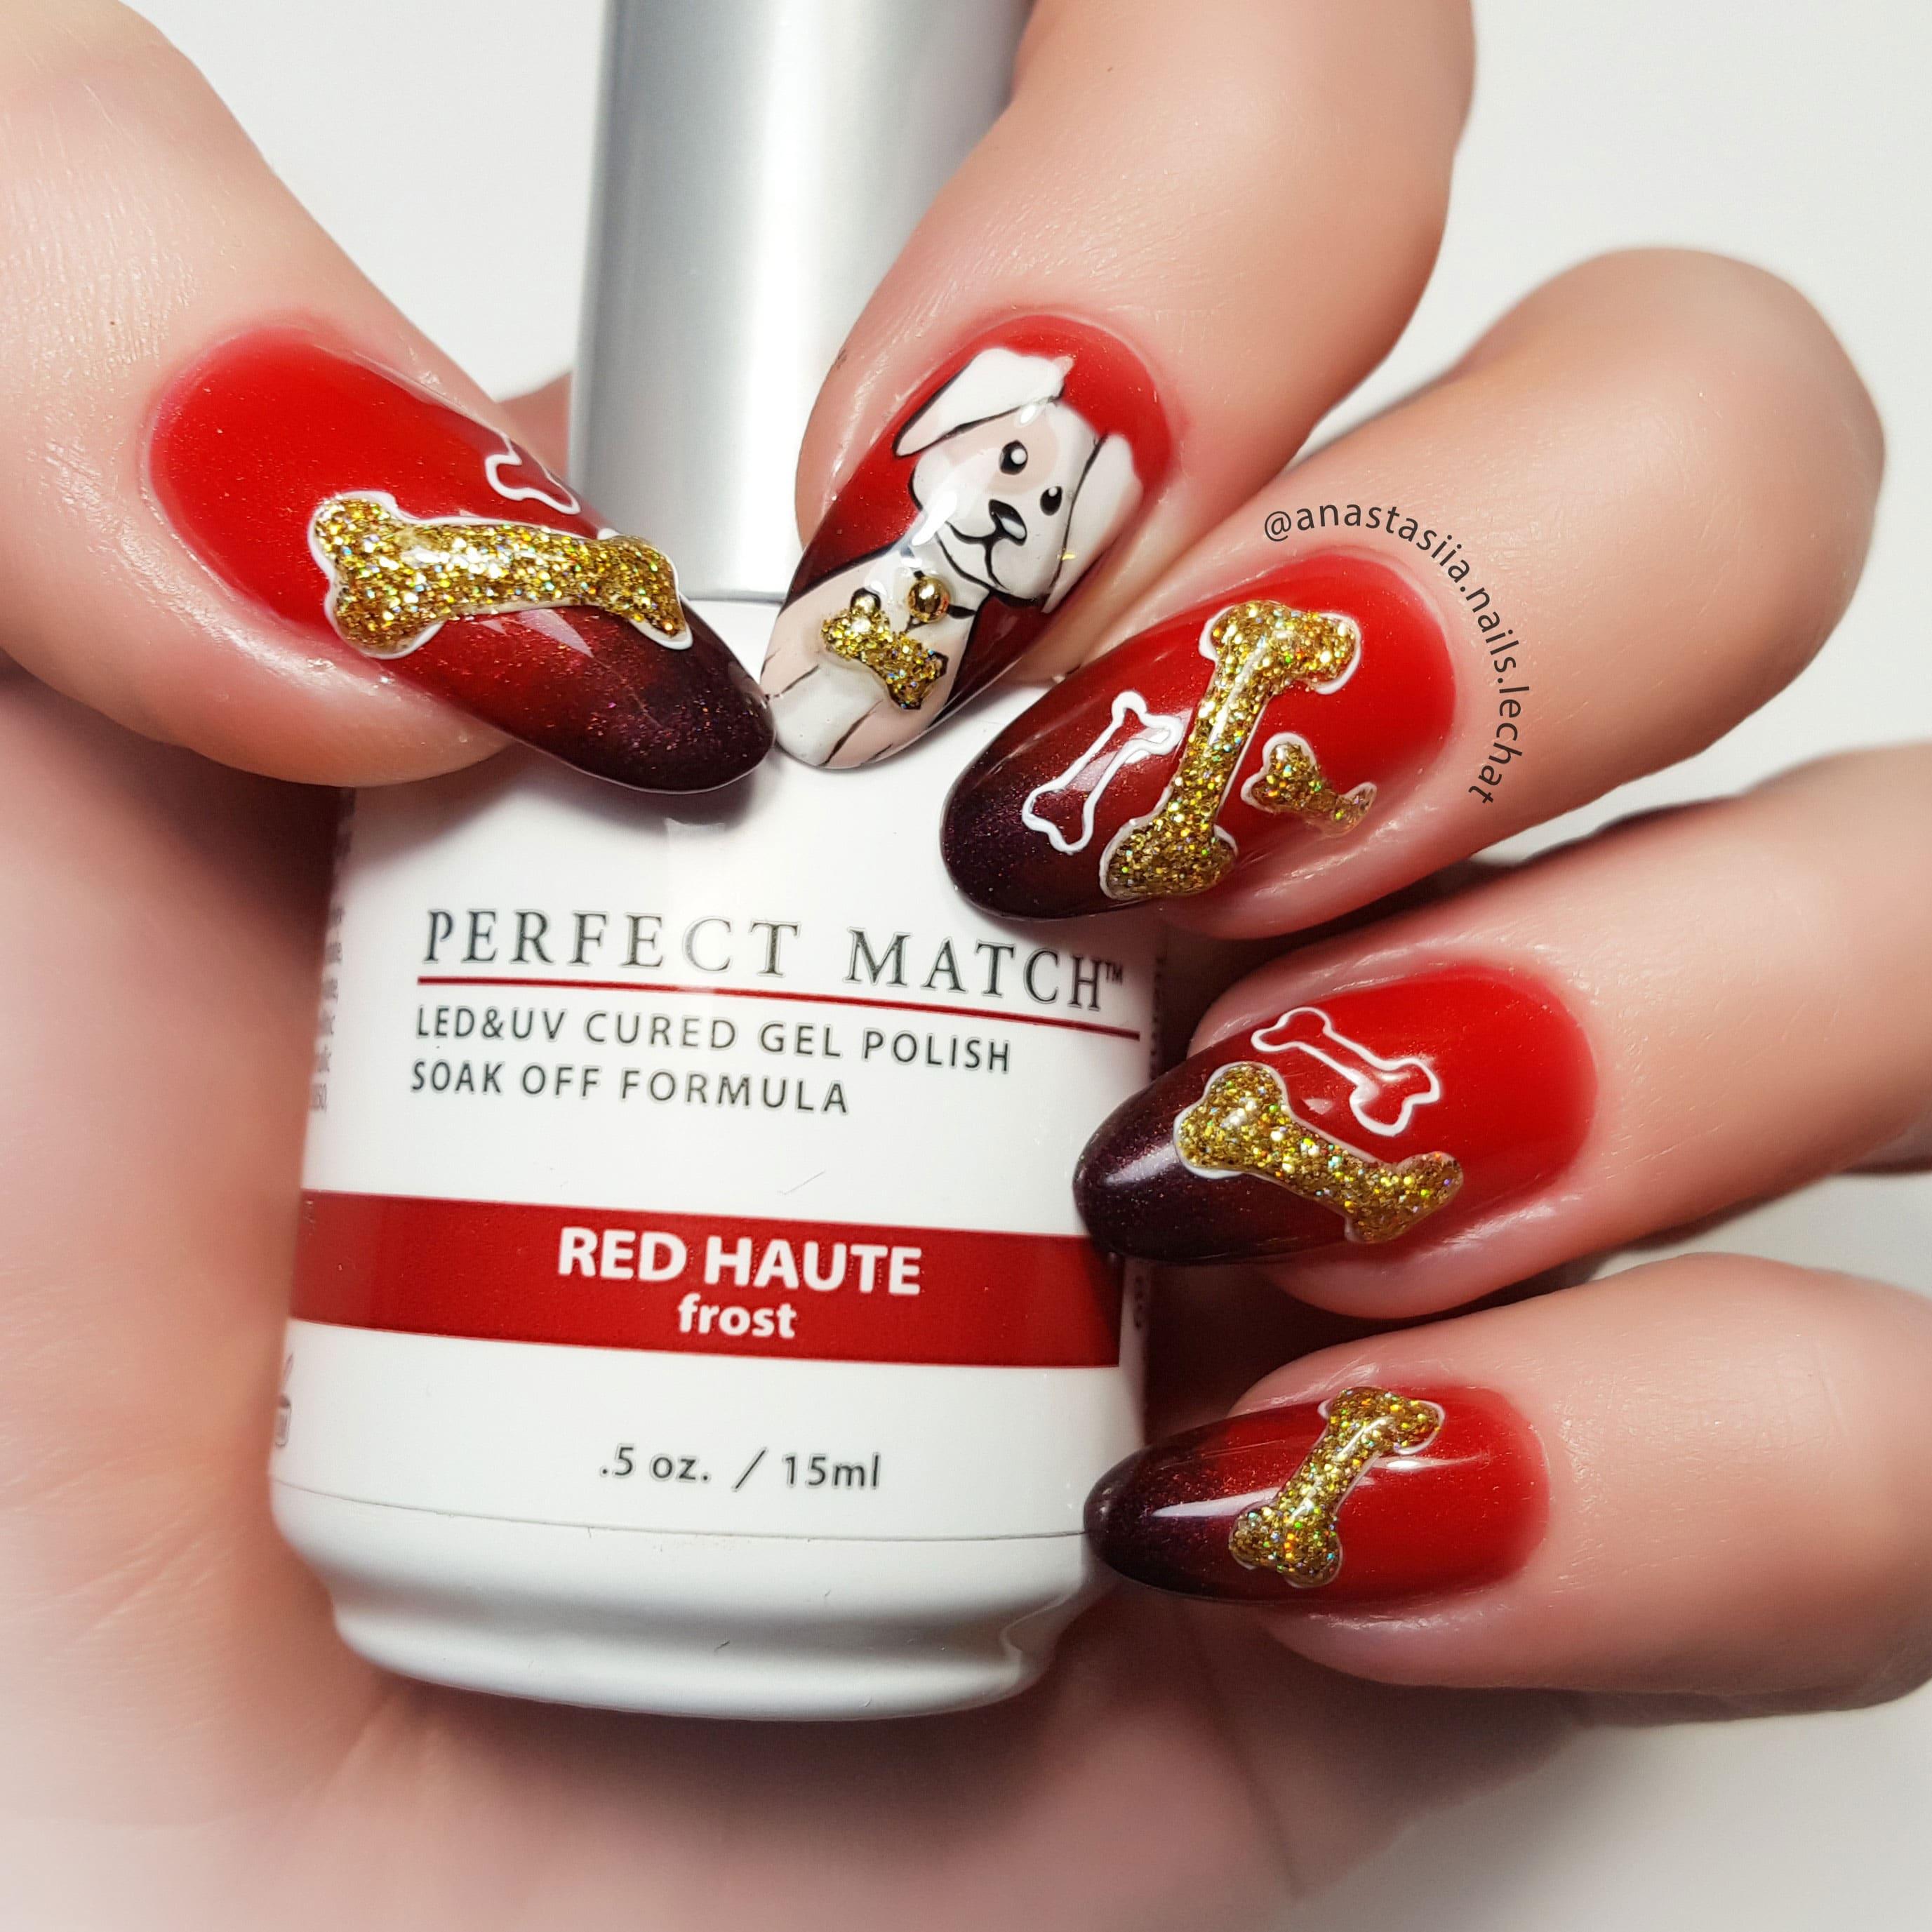 Pefect Match red haute